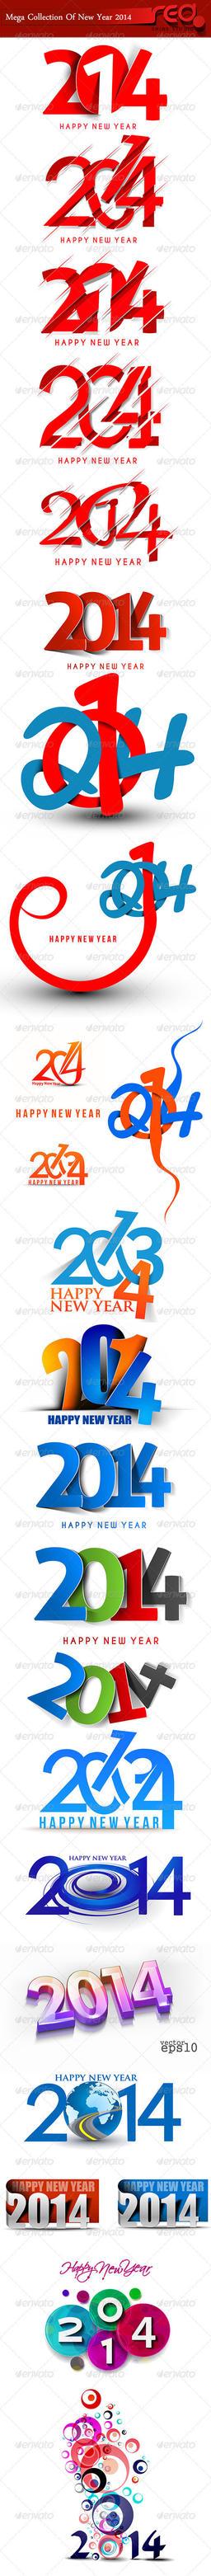 Happy New Year 2014 by Redshinestudio